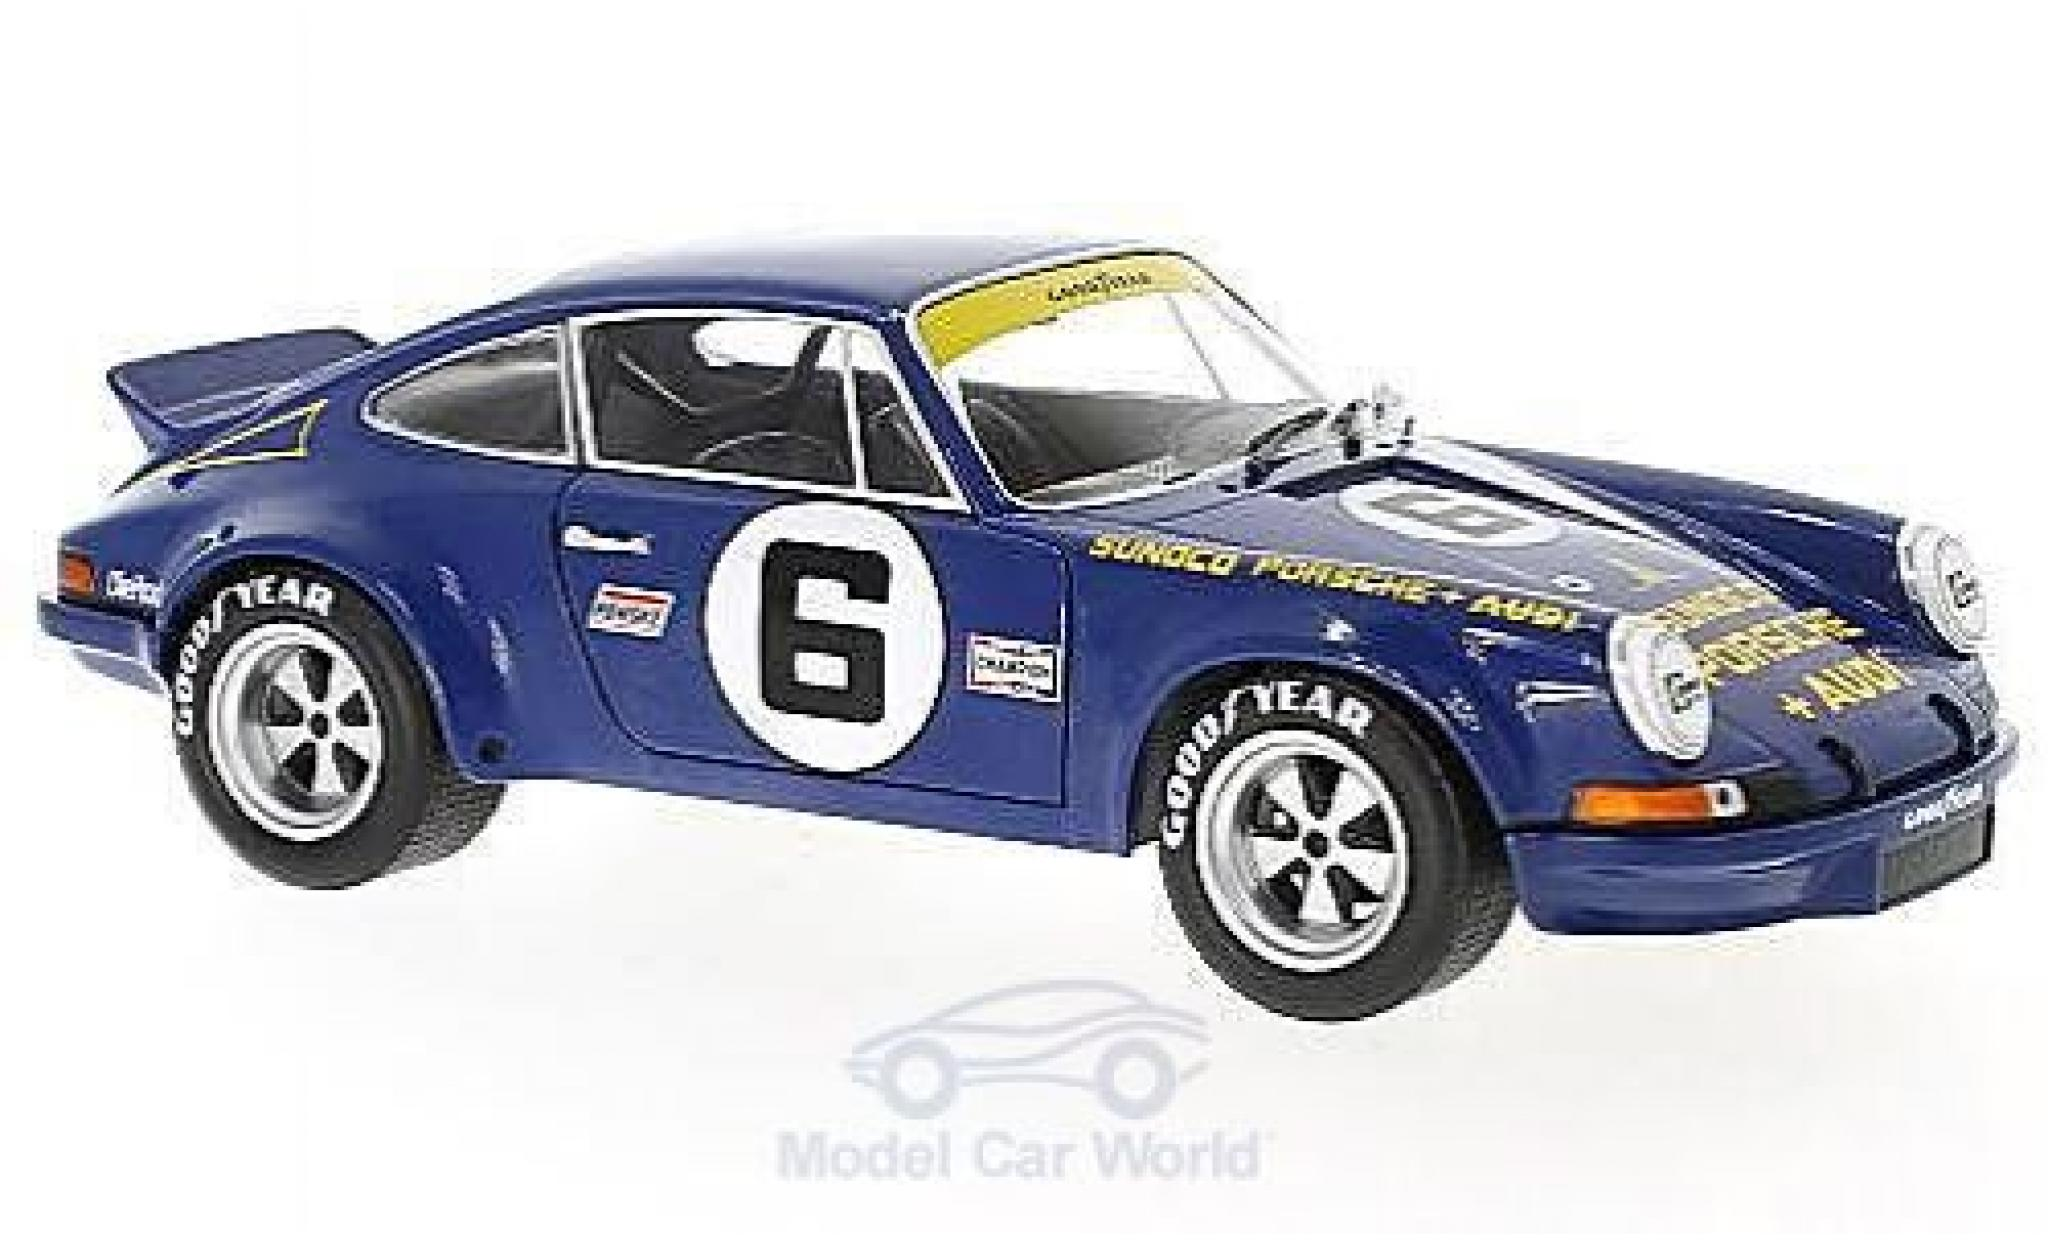 Porsche 911 SC 1/18 Solido RSR No.6 Penske Racing Sunoco 24h Daytona 1973 M.Donohue/G.Follmer